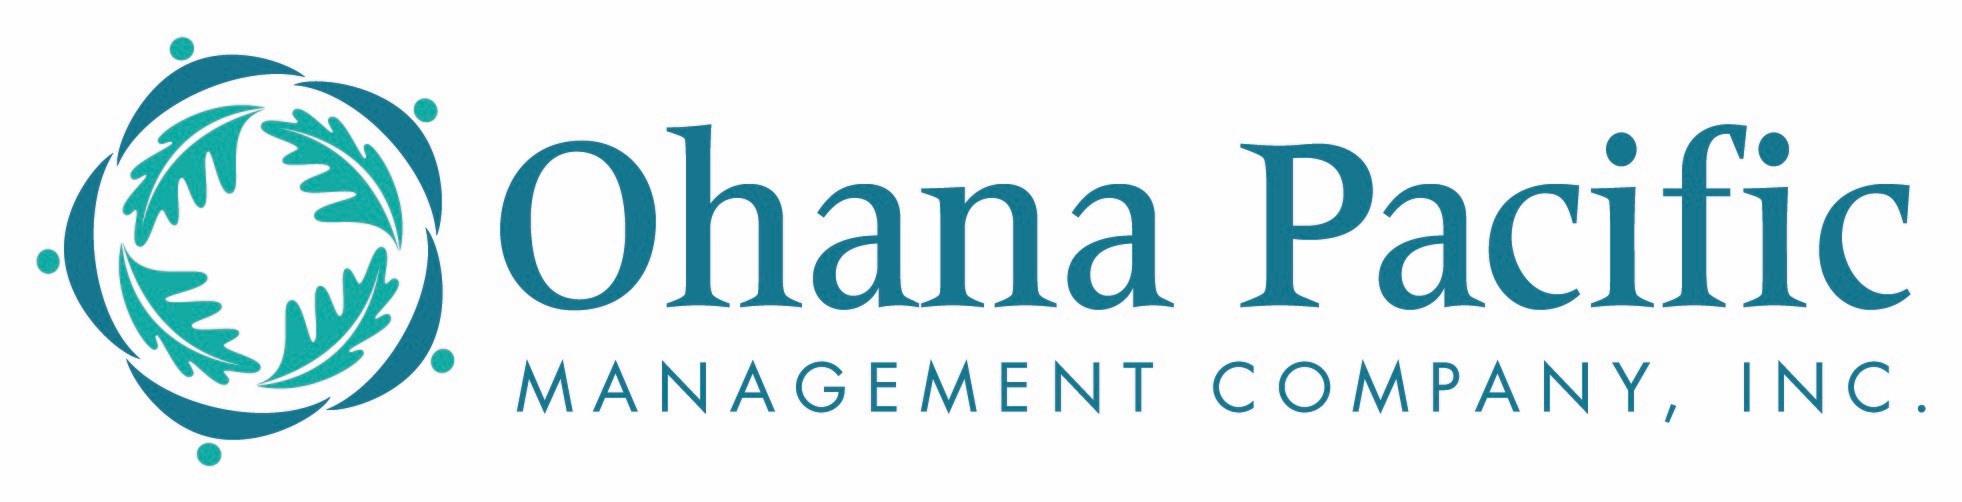 Ohana Pacific Management